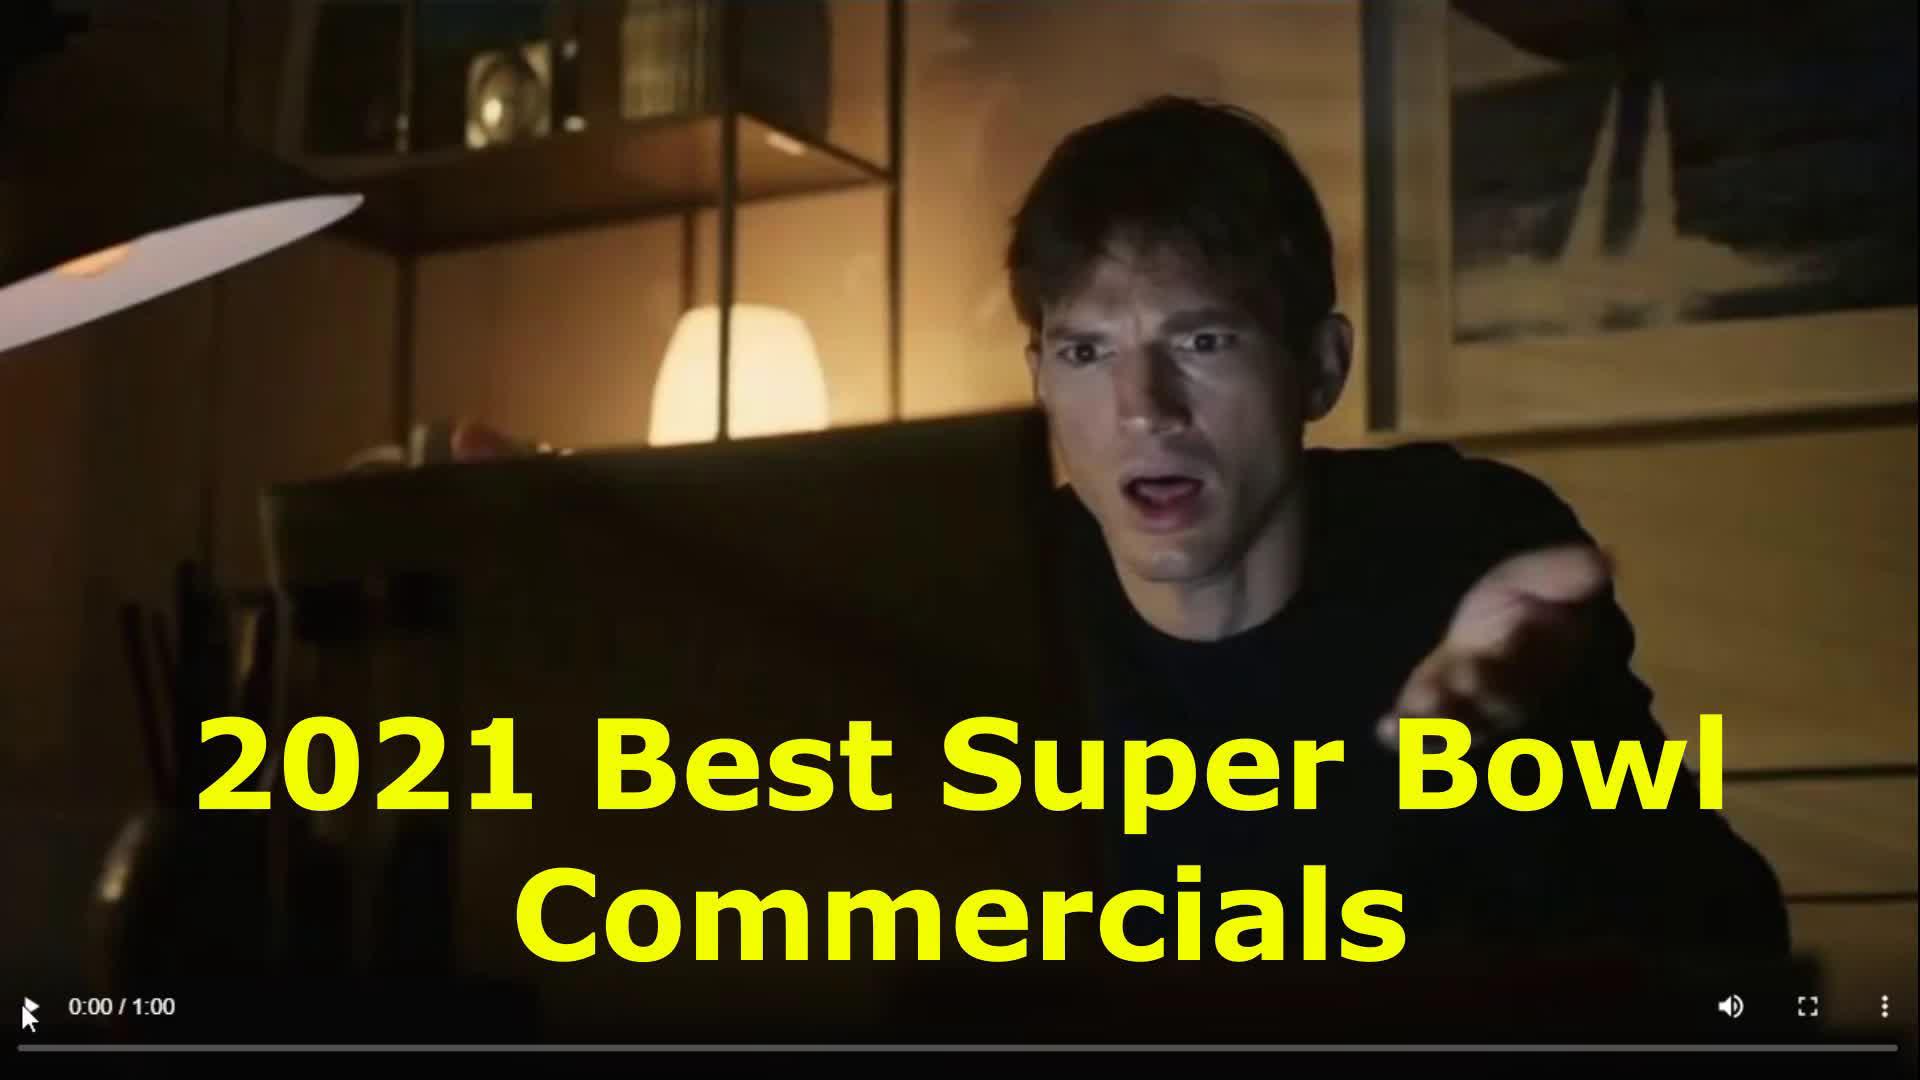 You Decide - Watch The 2021 Best Super Bowl Commercials